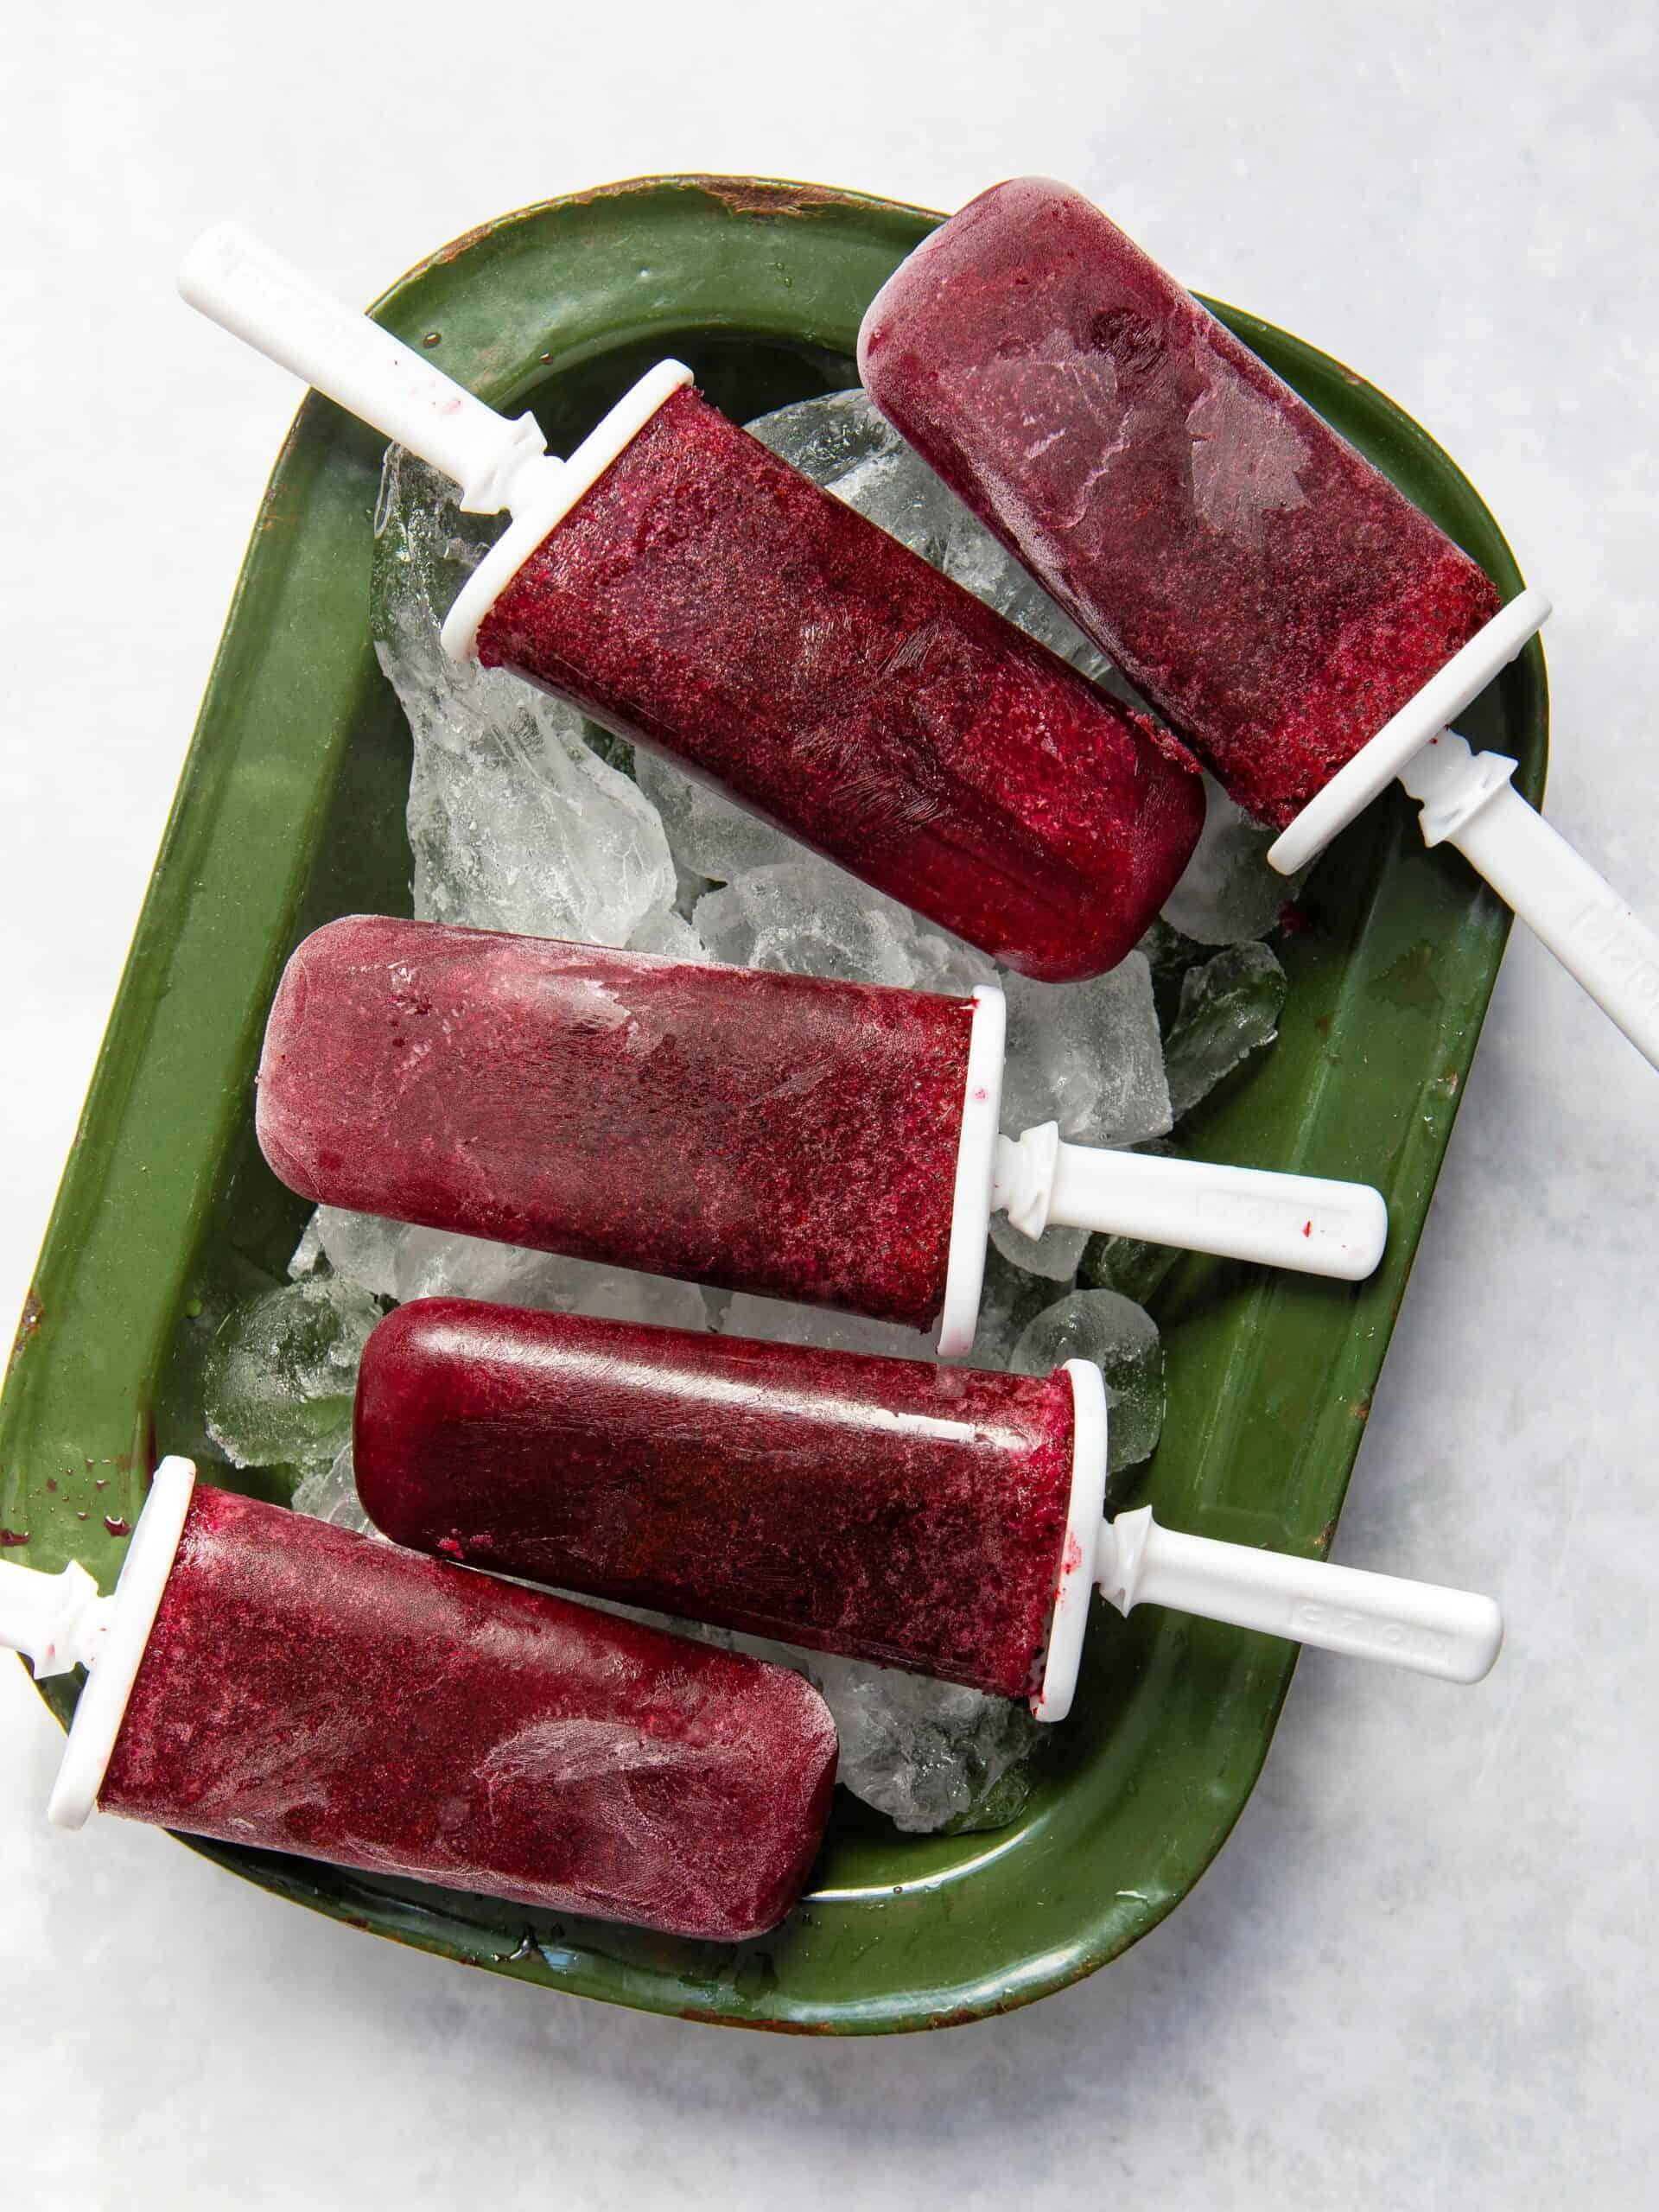 Blueberry Ice Lollies - 3 ingredients, 5 mins prep both gluten-free & vegan!